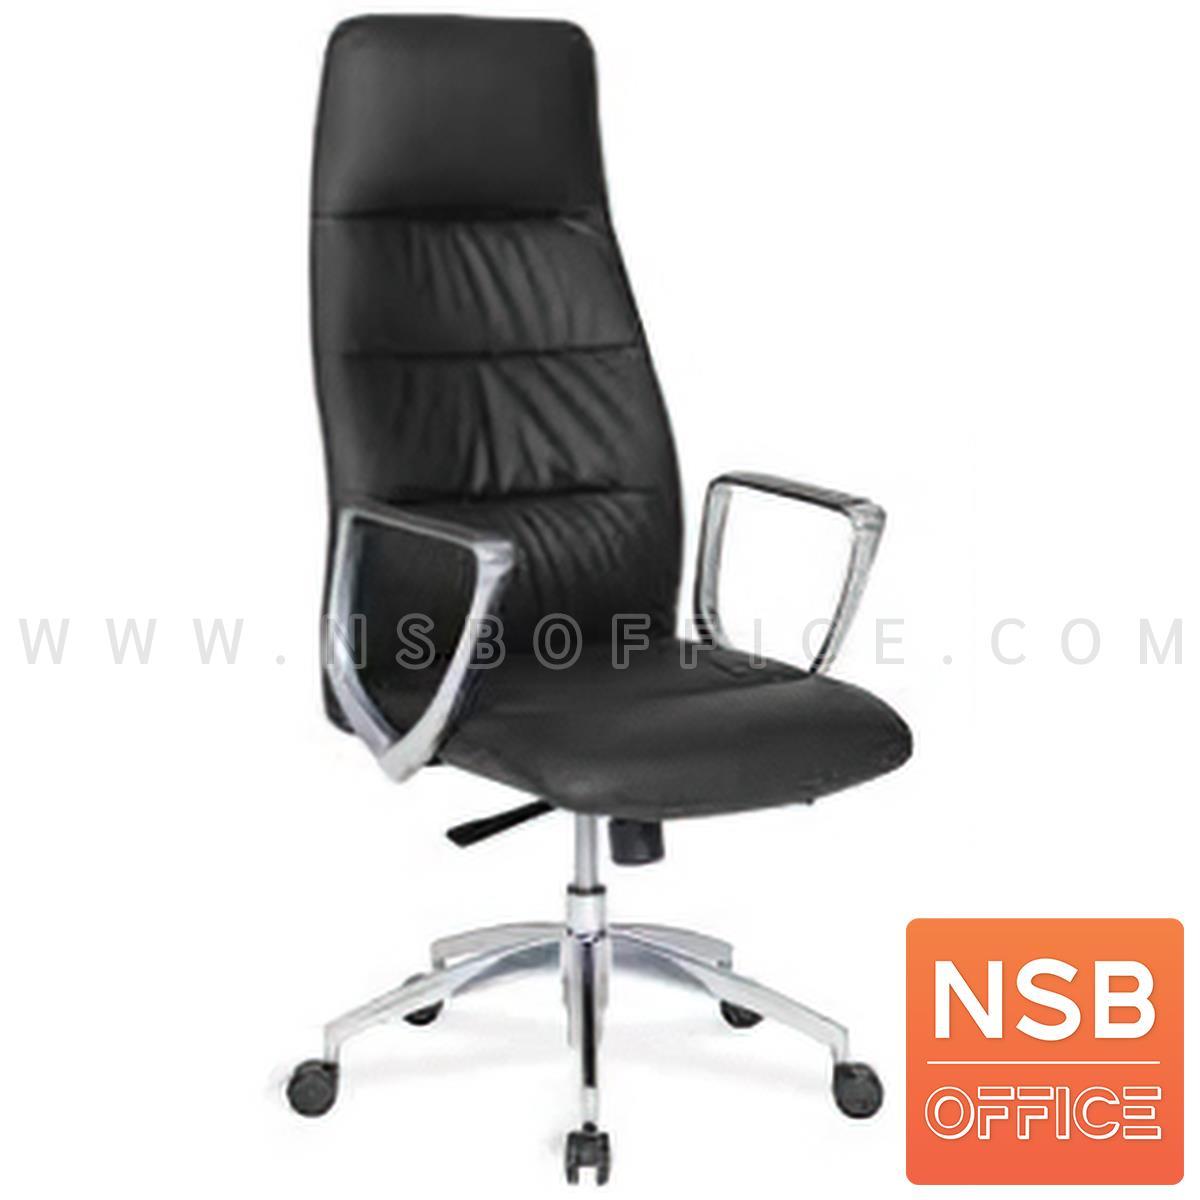 B01A537:เก้าอี้ผู้บริหาร รุ่น Pretzel (เพรทเซล)  โช๊คแก๊ส ก้อนโยก ขาอลูมิเนียม